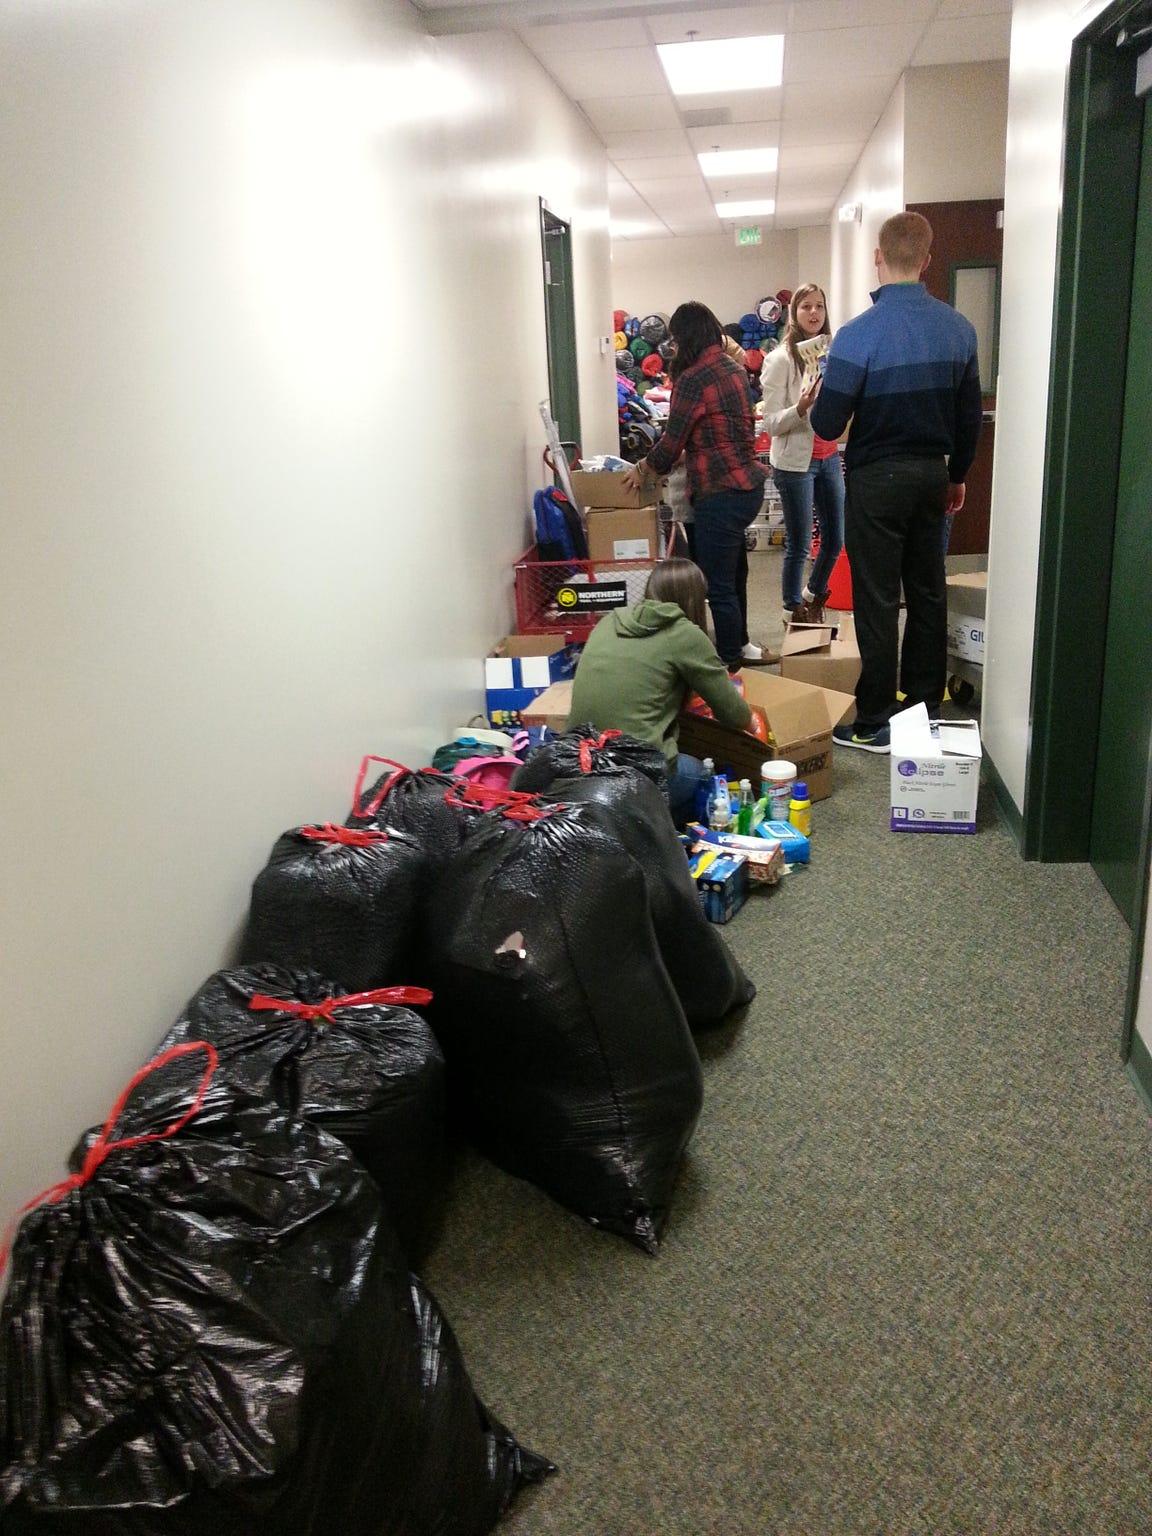 Enterprise High School students peruse a hallway filled